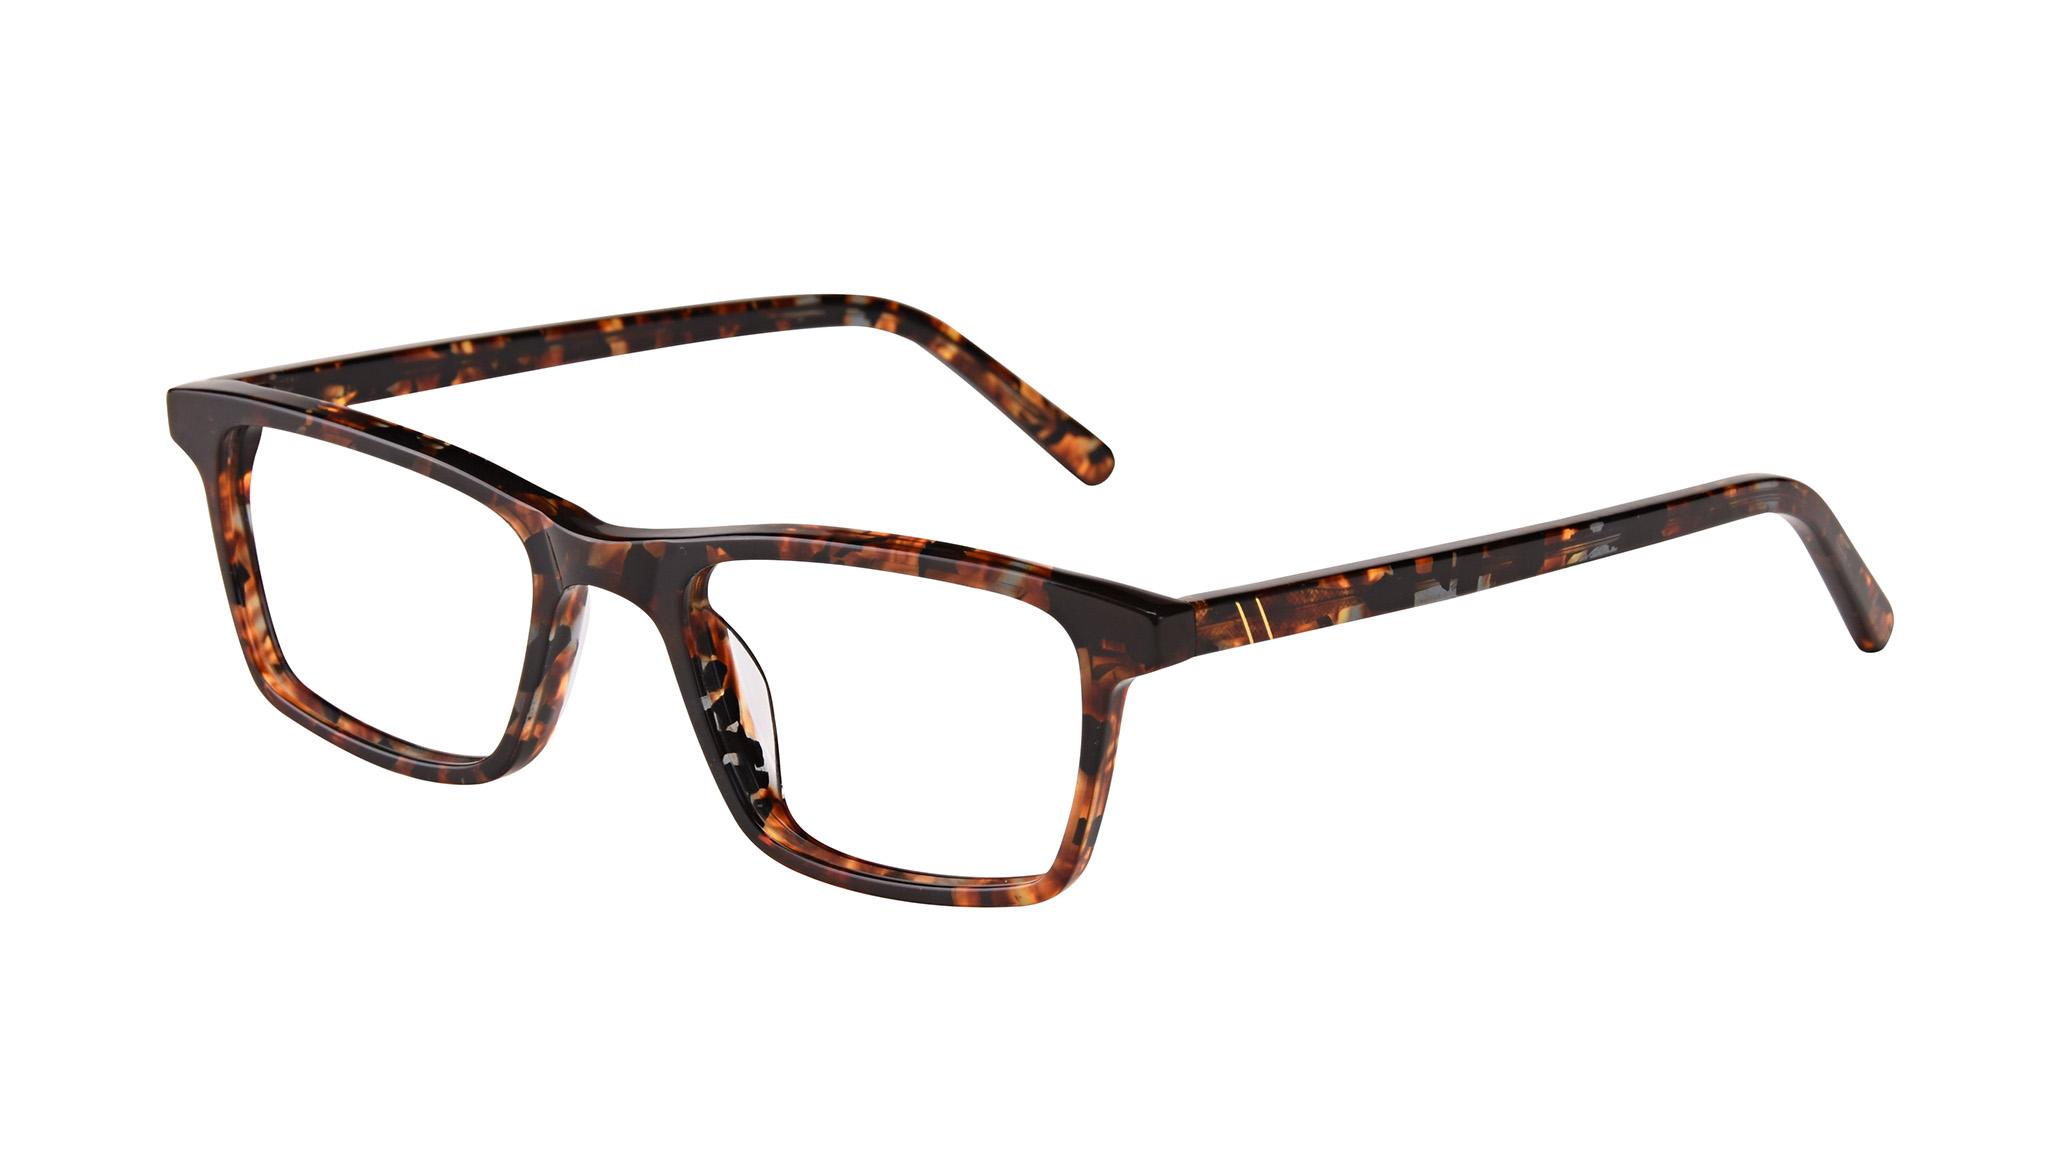 42a8b01caa5d Affordable fashion glasses rectangle eyeglasses men henri mohagany tilt jpg  1600x707 Mlg glasses tilted